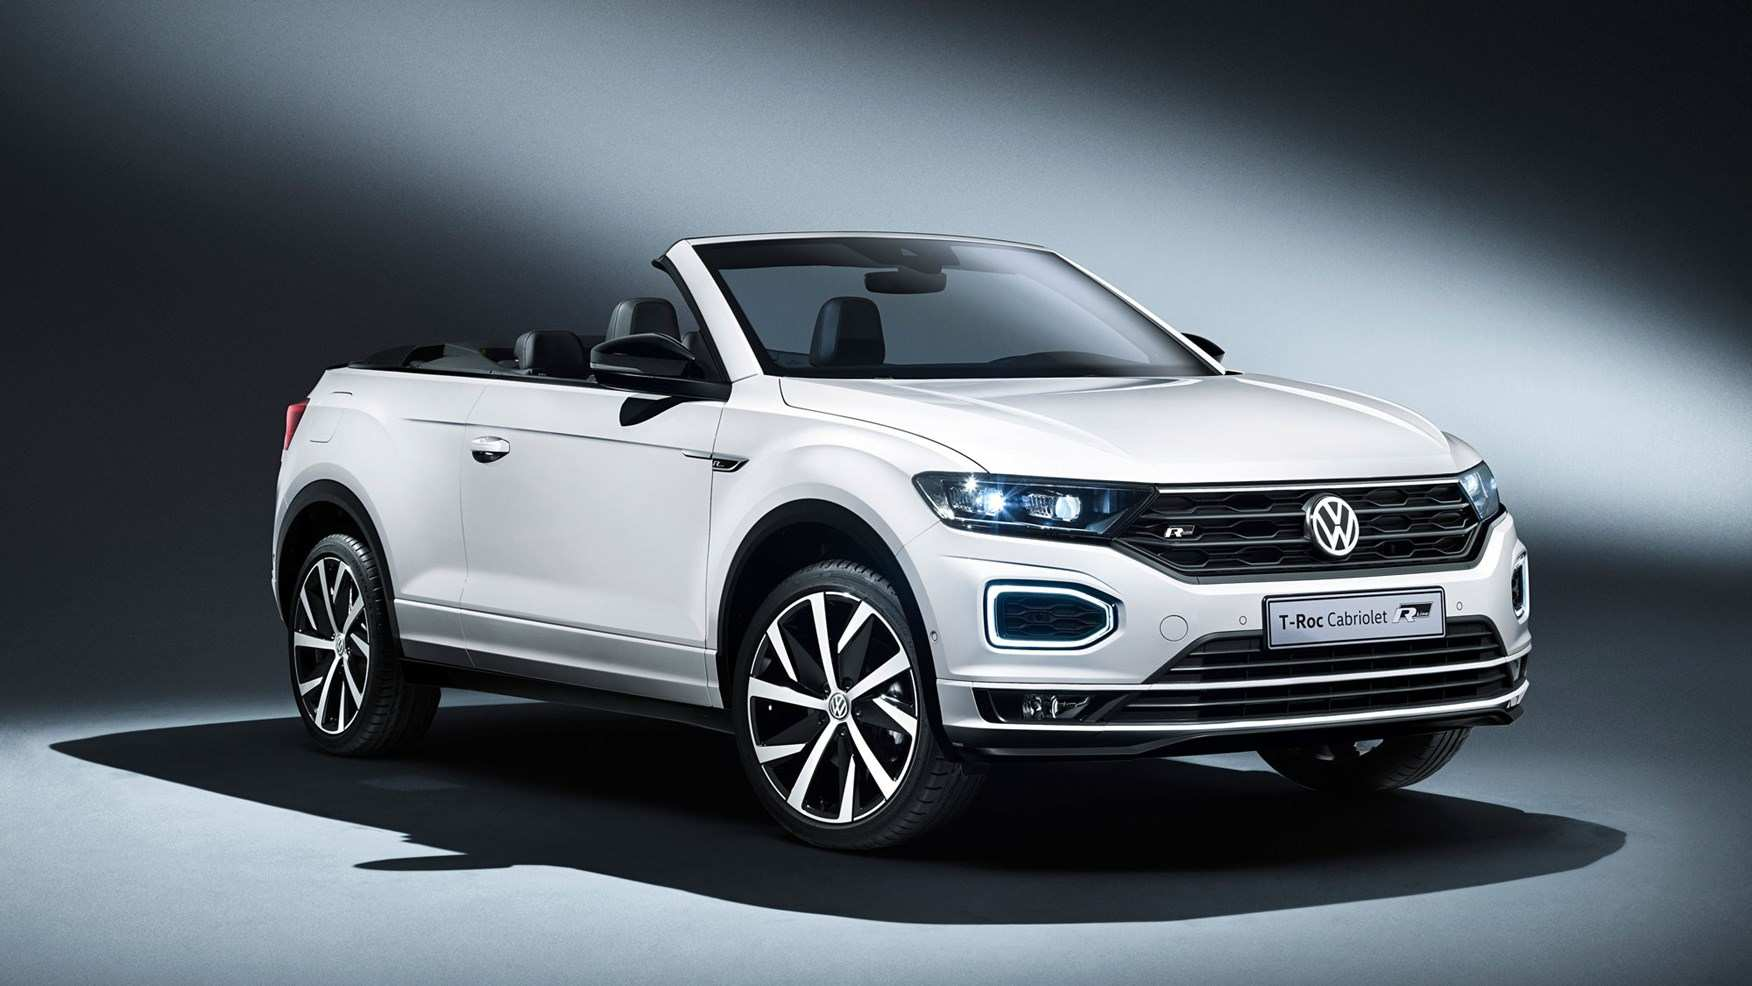 11 All New Volkswagen T Roc Cabrio 2020 Release Date by Volkswagen T Roc Cabrio 2020